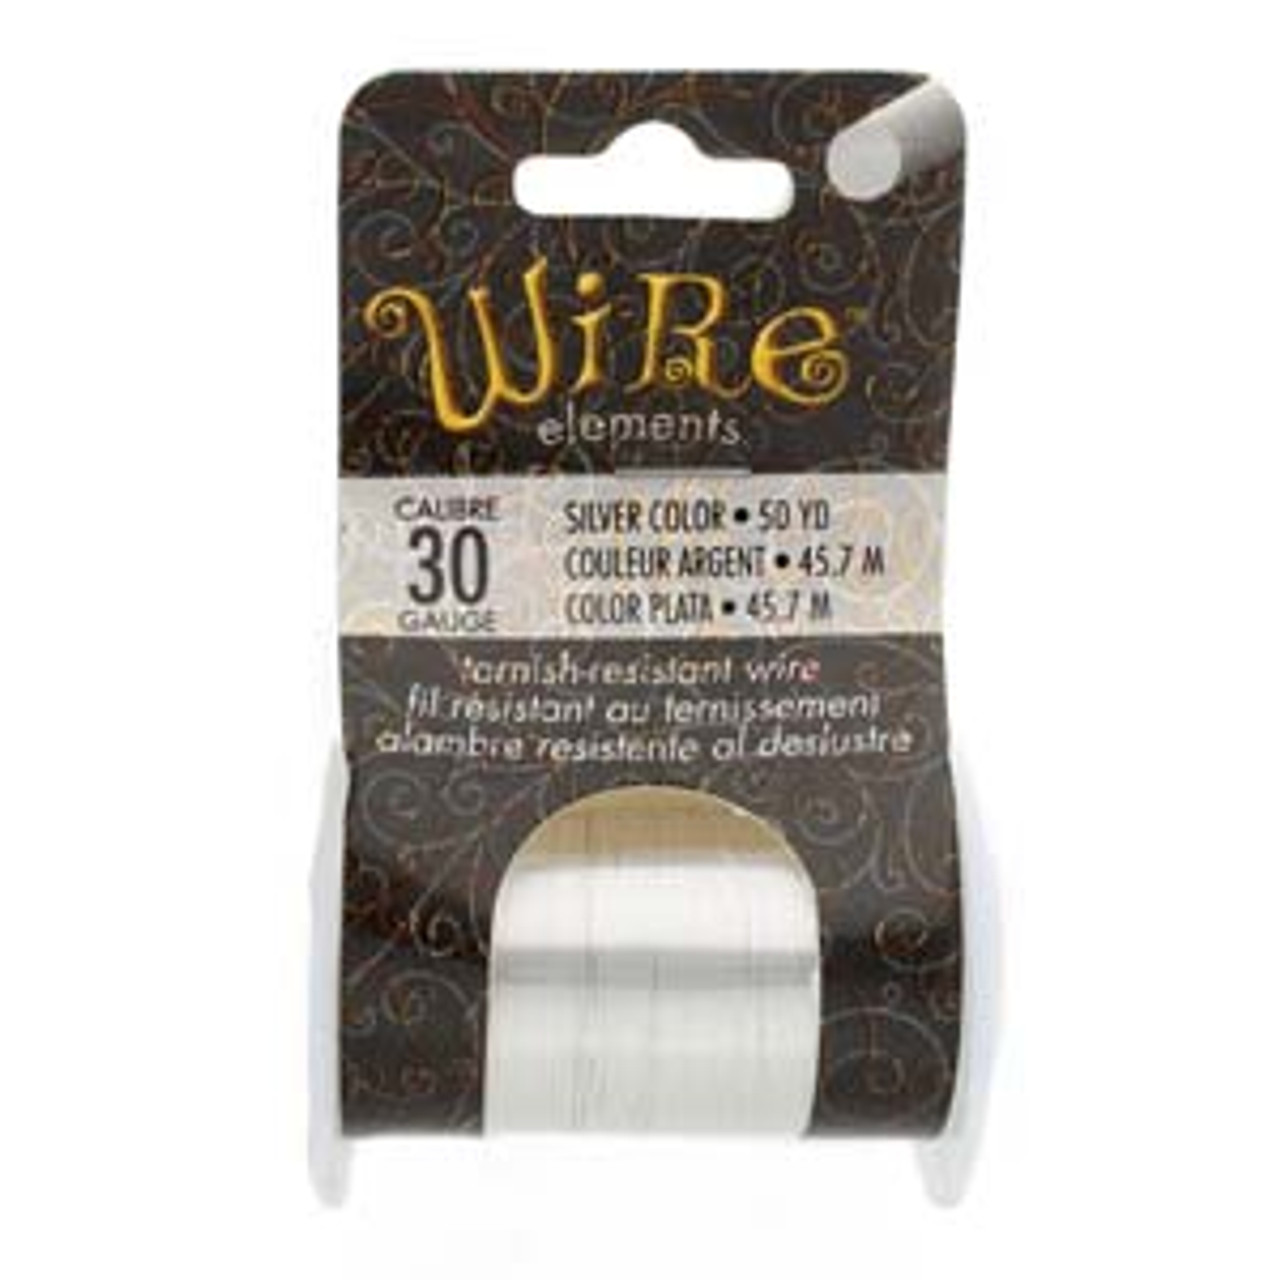 30ga Silver Wire Elements Wire (50yd spool)